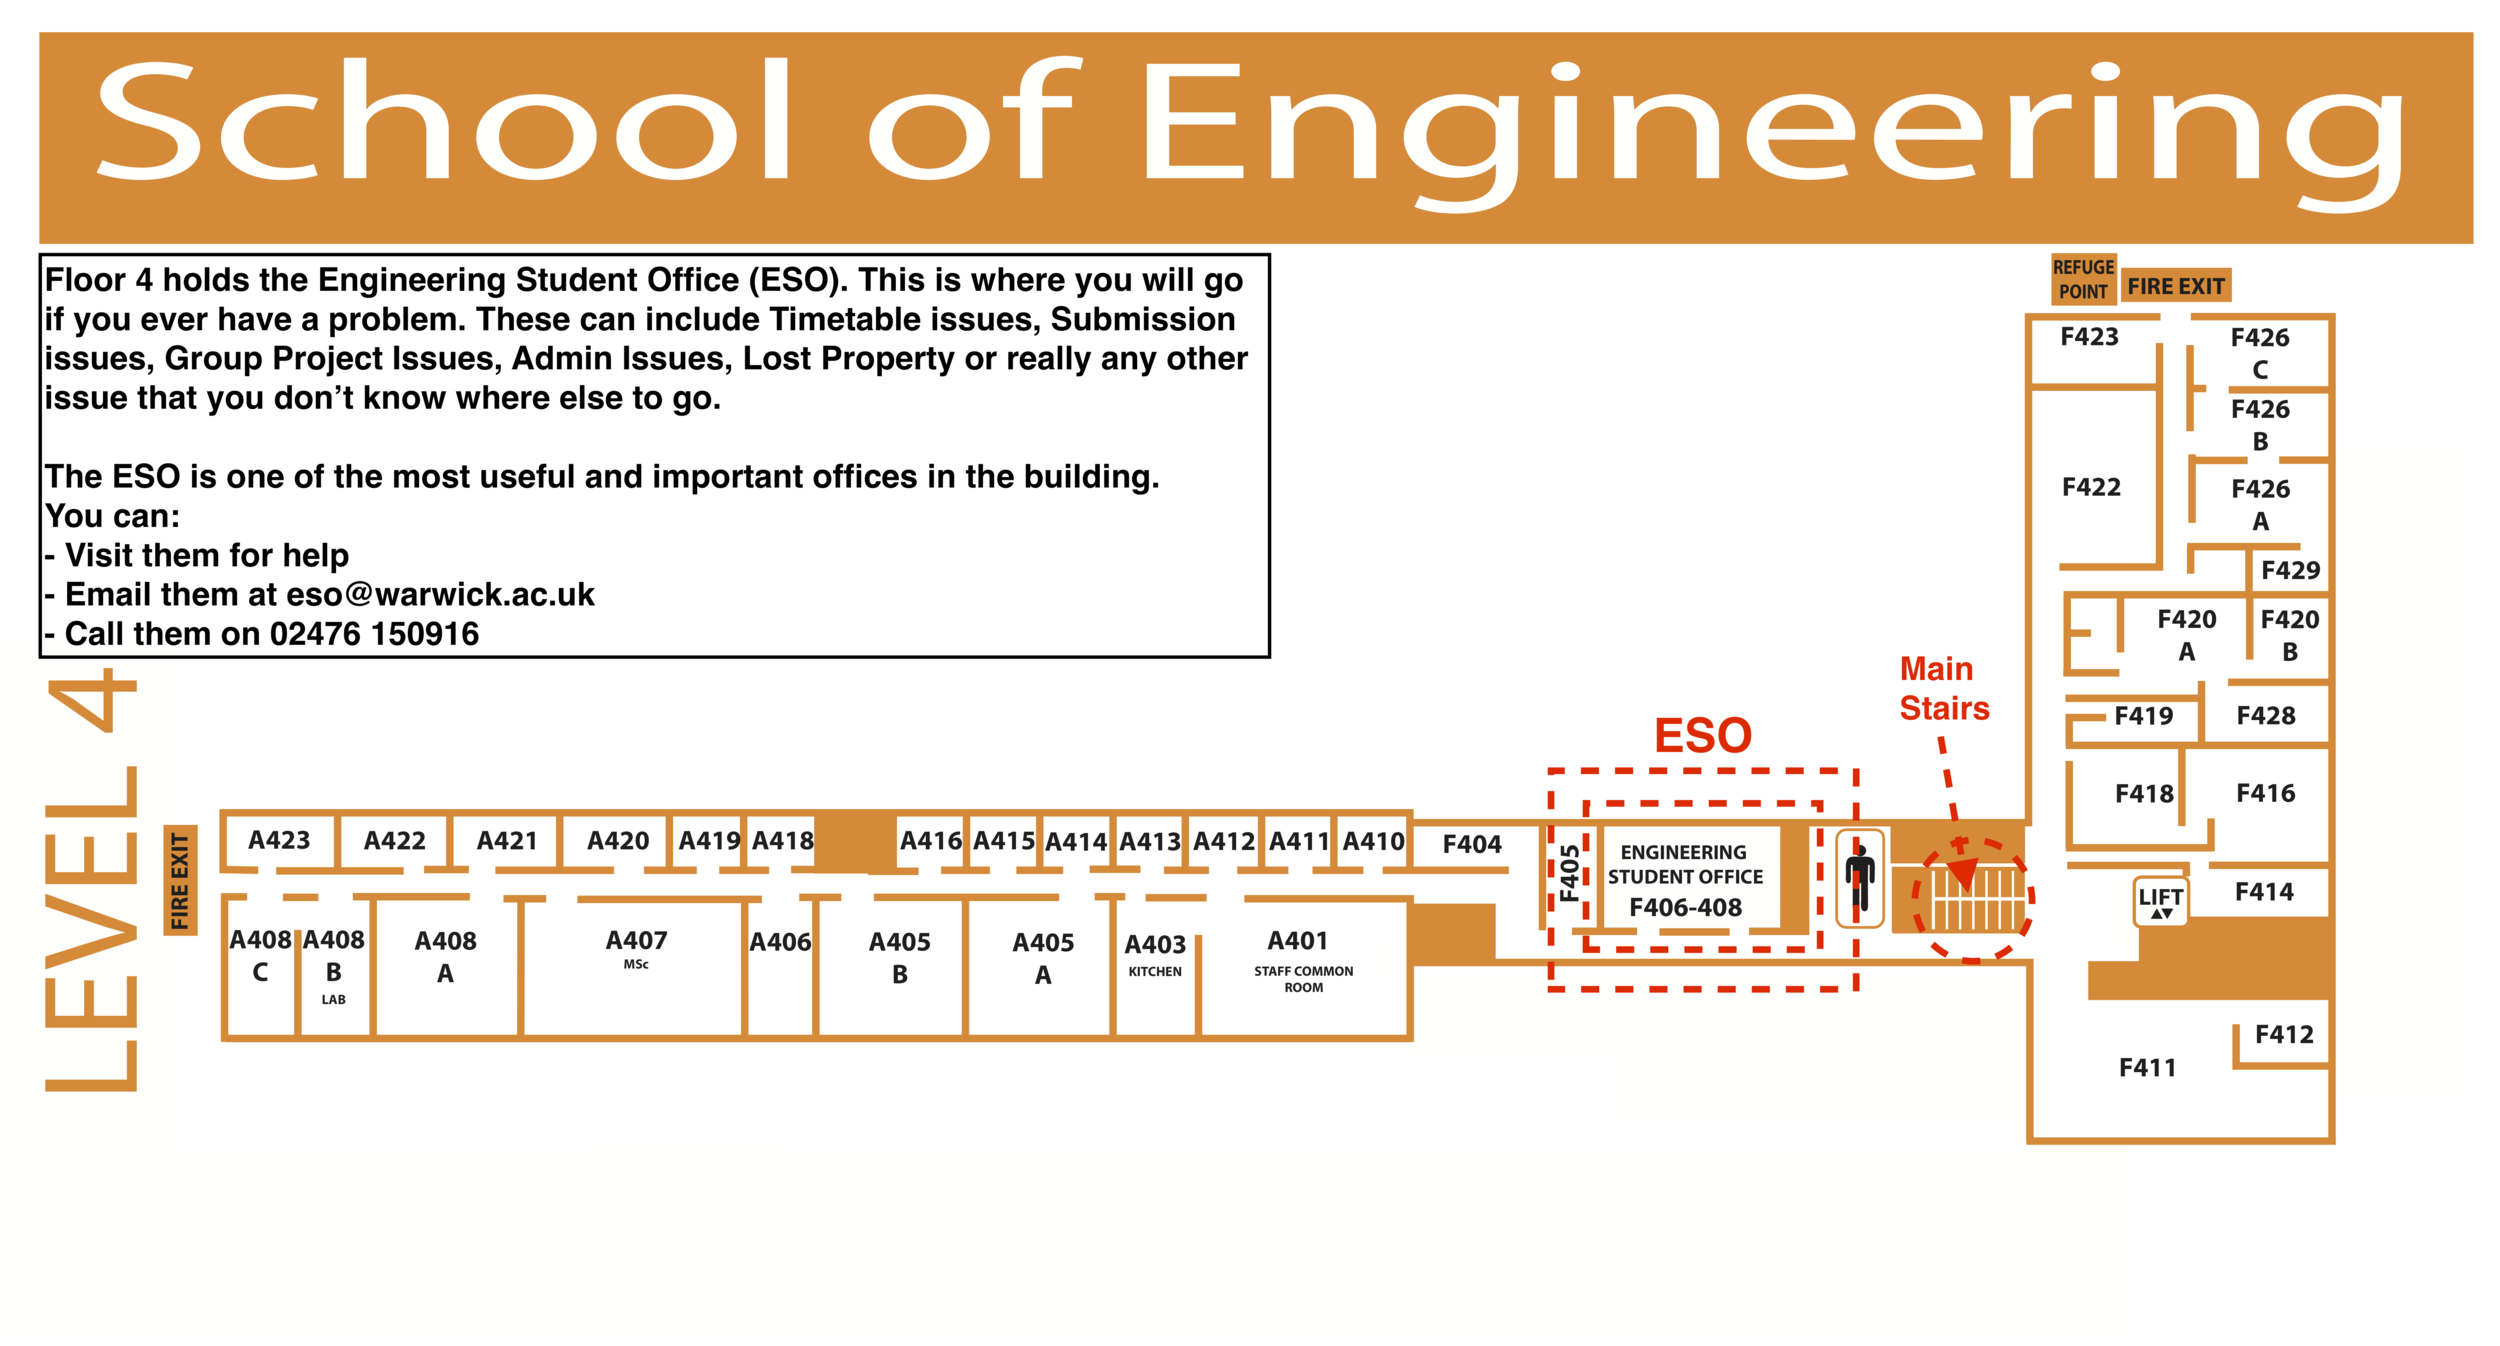 Level 4 - Engineering